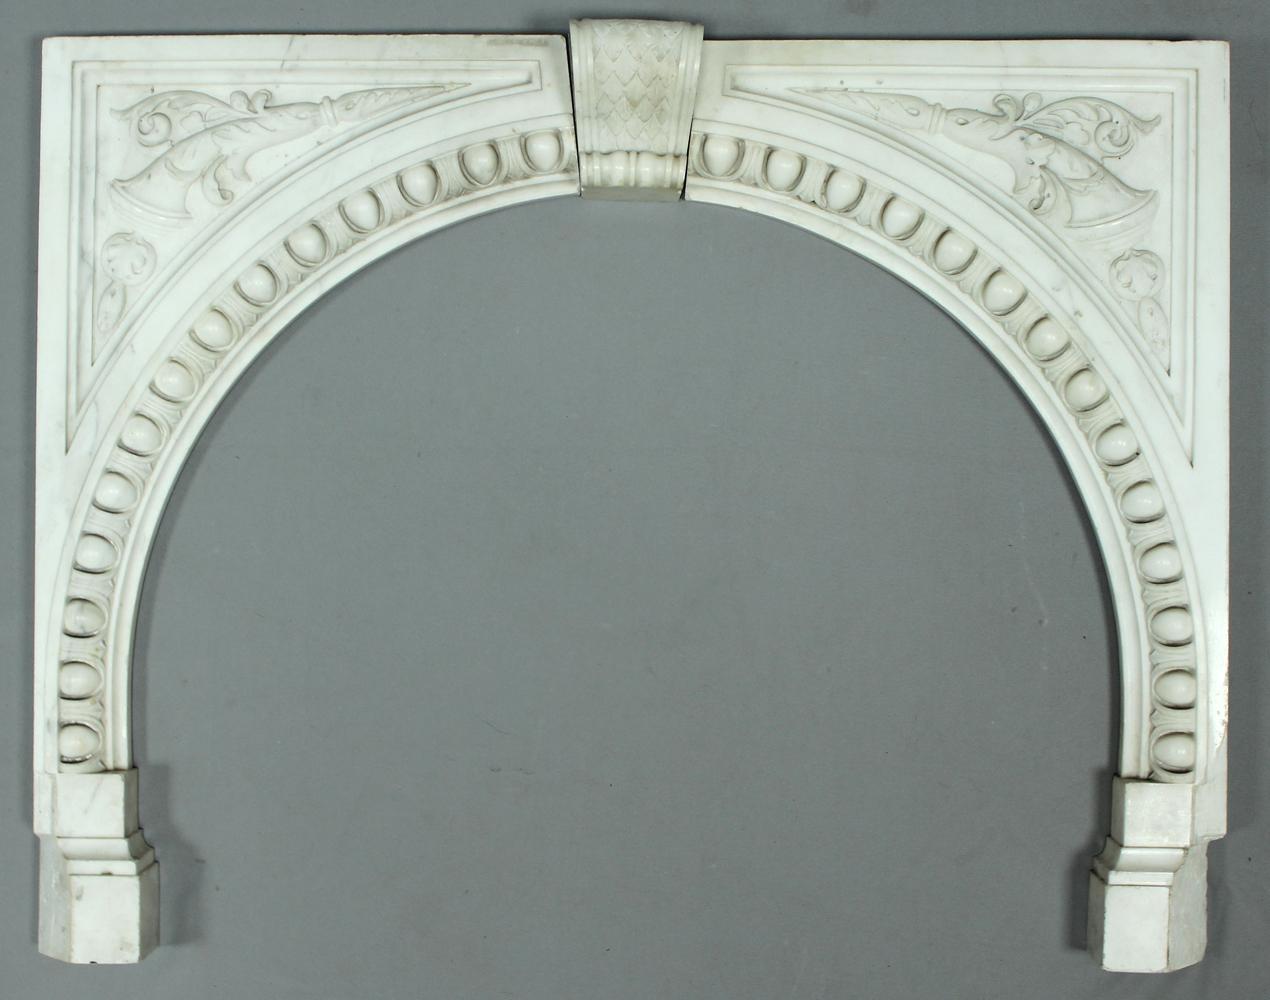 Kaminumrandung im klassizistischen stil objektdetail for Stilwerk berlin verkaufsoffener sonntag